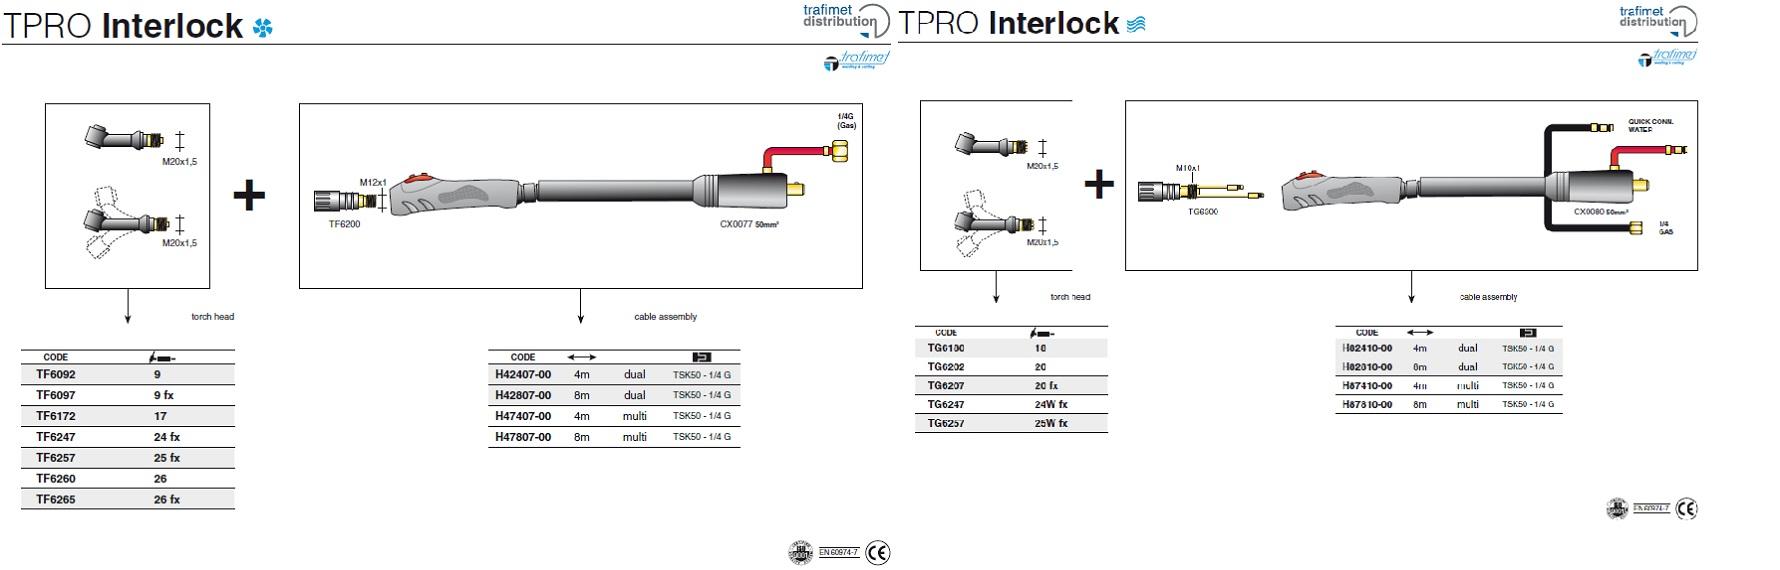 TPRO Interlock II